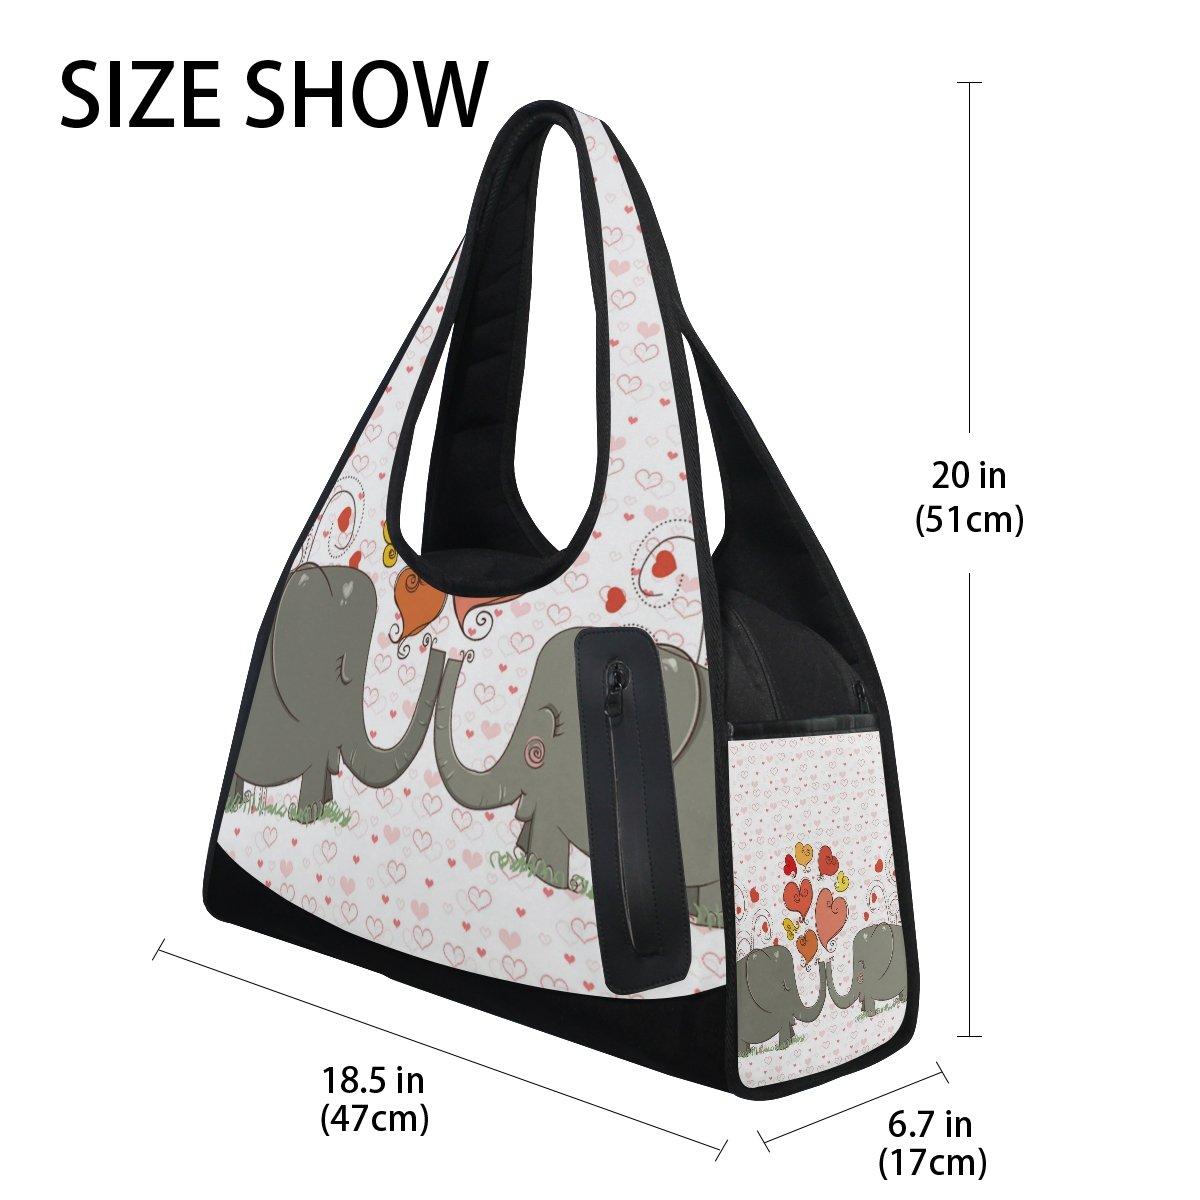 AHOMY Sports Gym Bag Elephant Love Heart Duffel Bag Travel Shoulder Bag by AHOMY (Image #4)